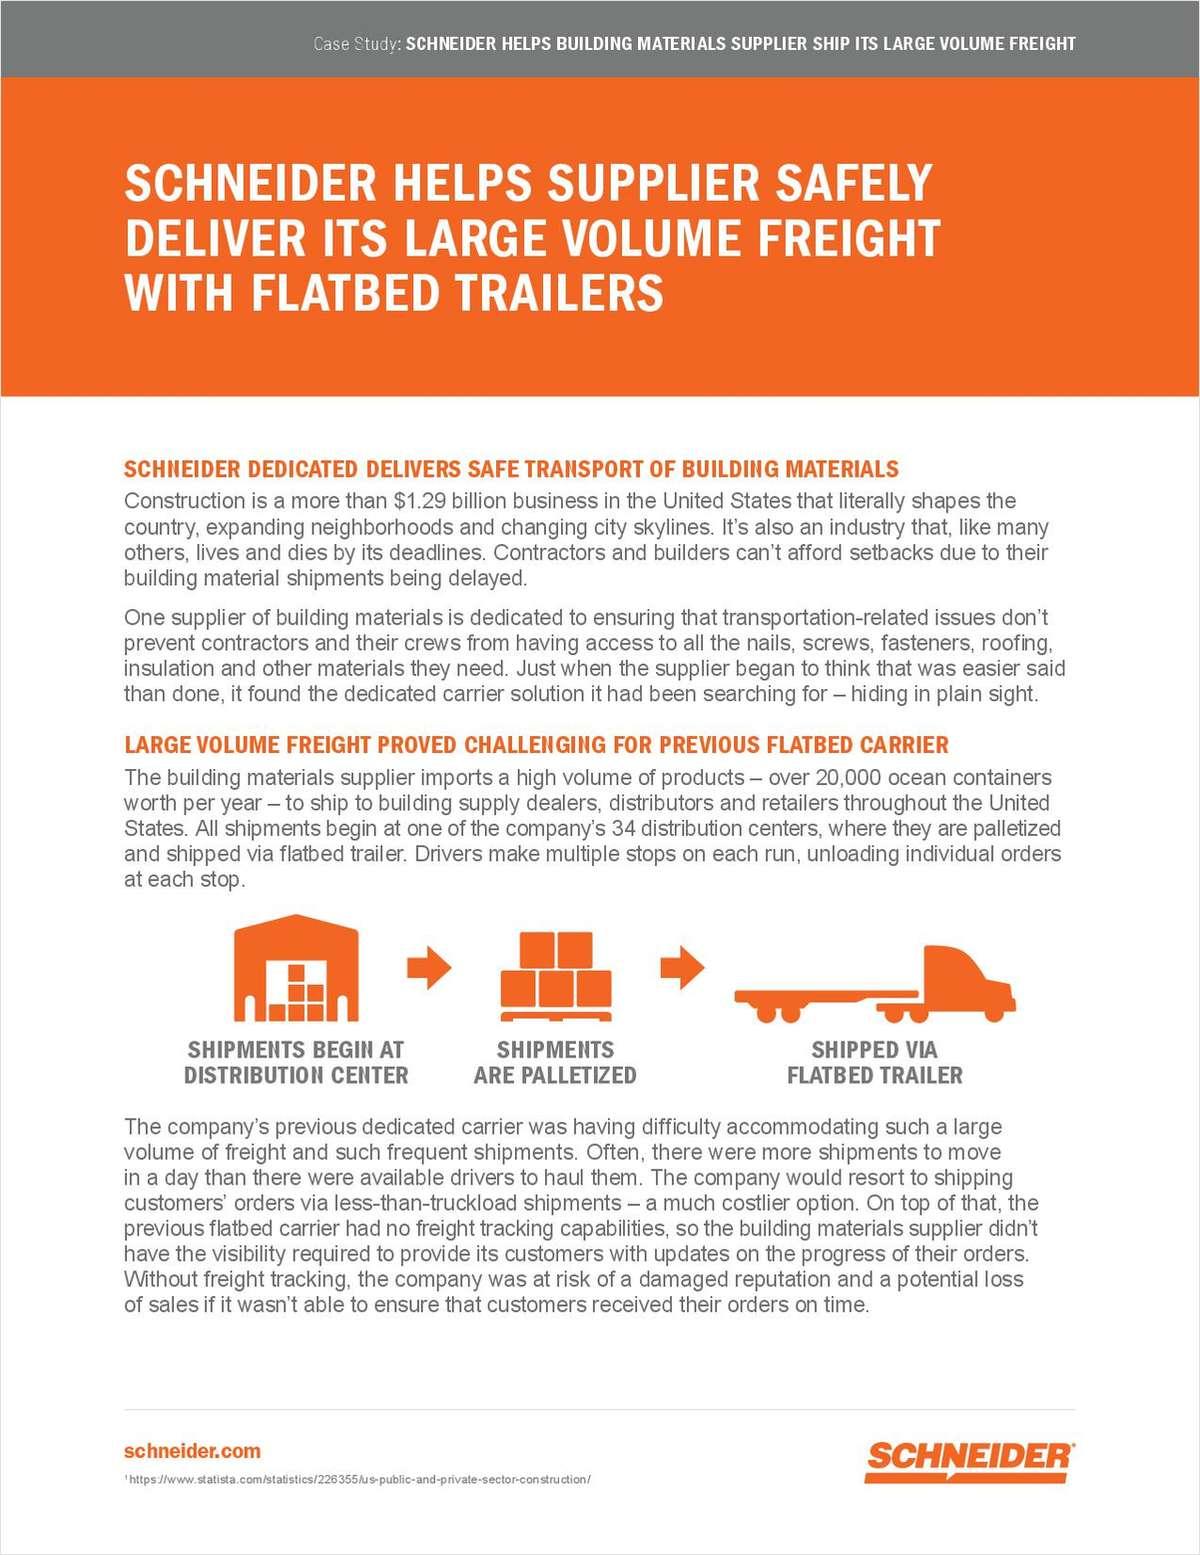 Safe Execution of Large Volume Flatbed Freight Delivered